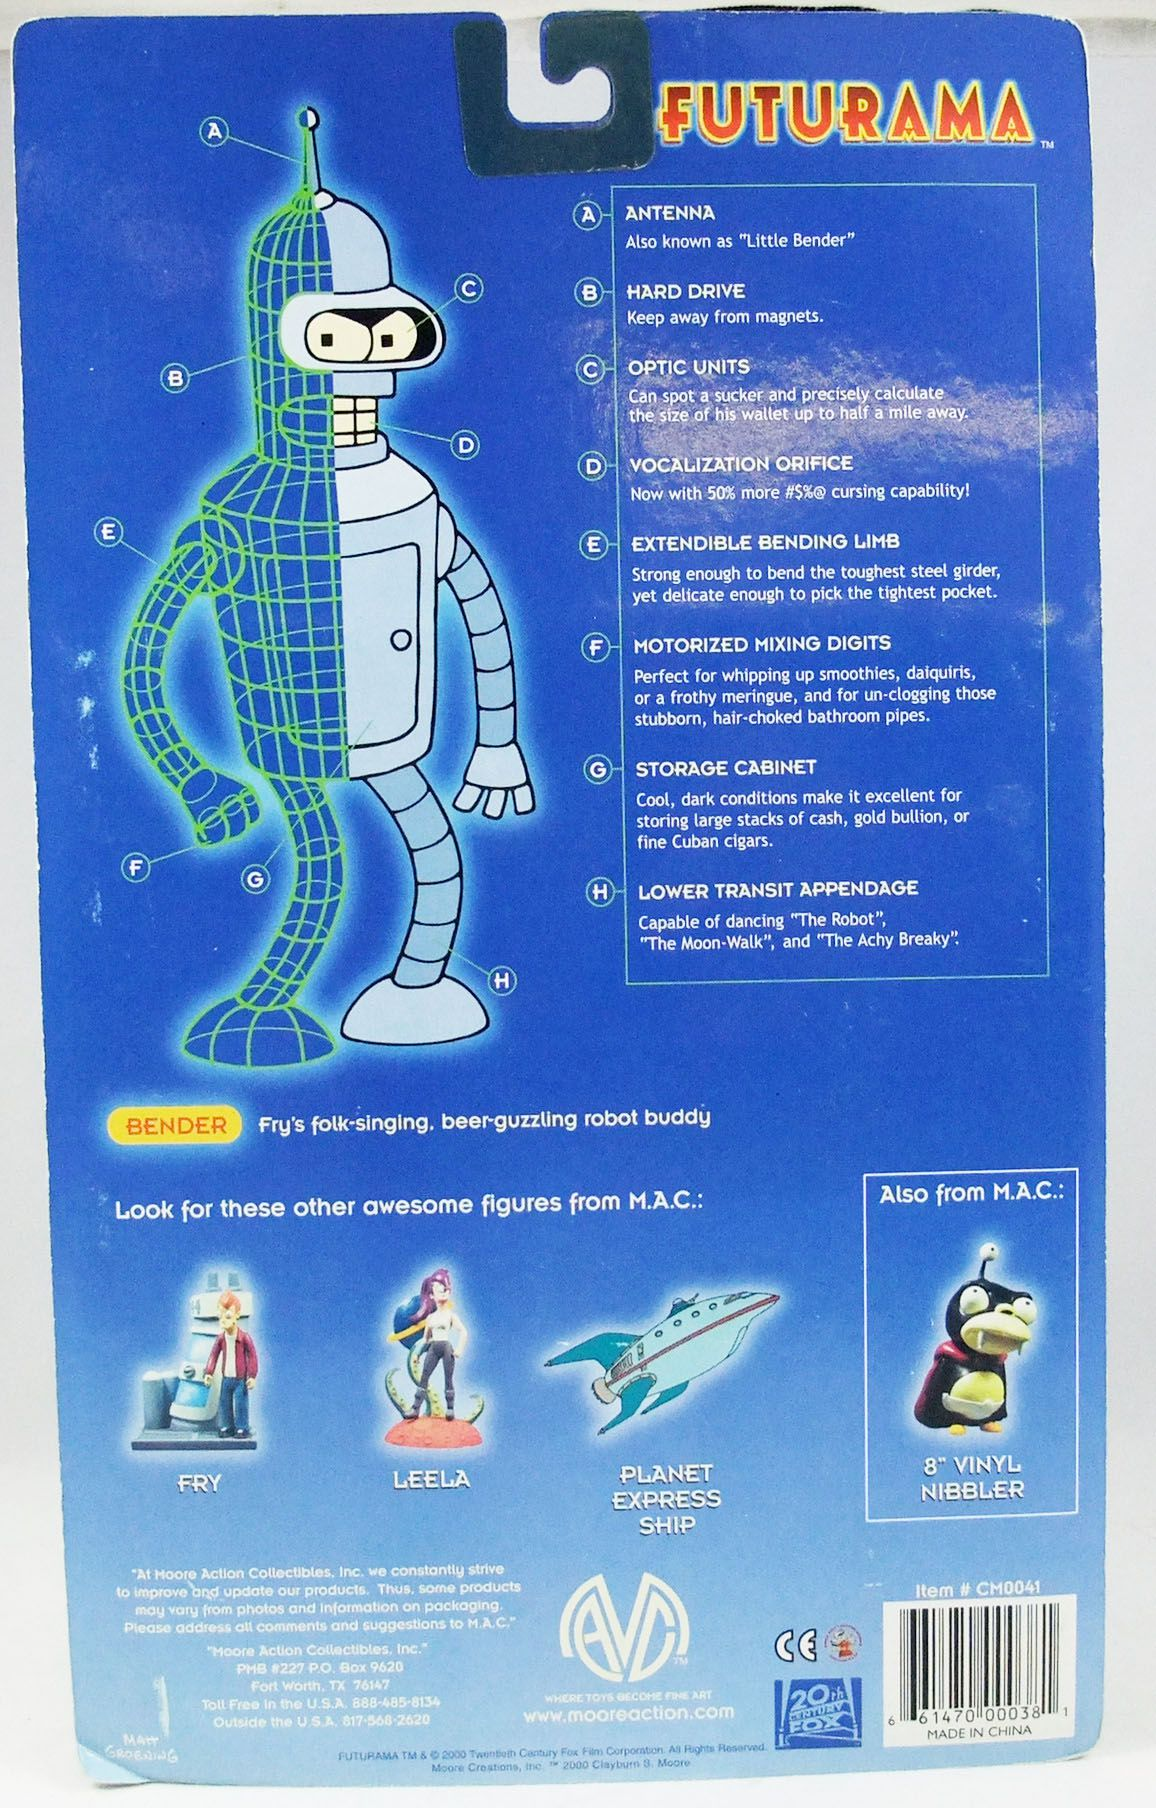 Futurama - Moore Action Collectibles - Chef Bender - Figurine articulée 15cm (Previews Exclusive)